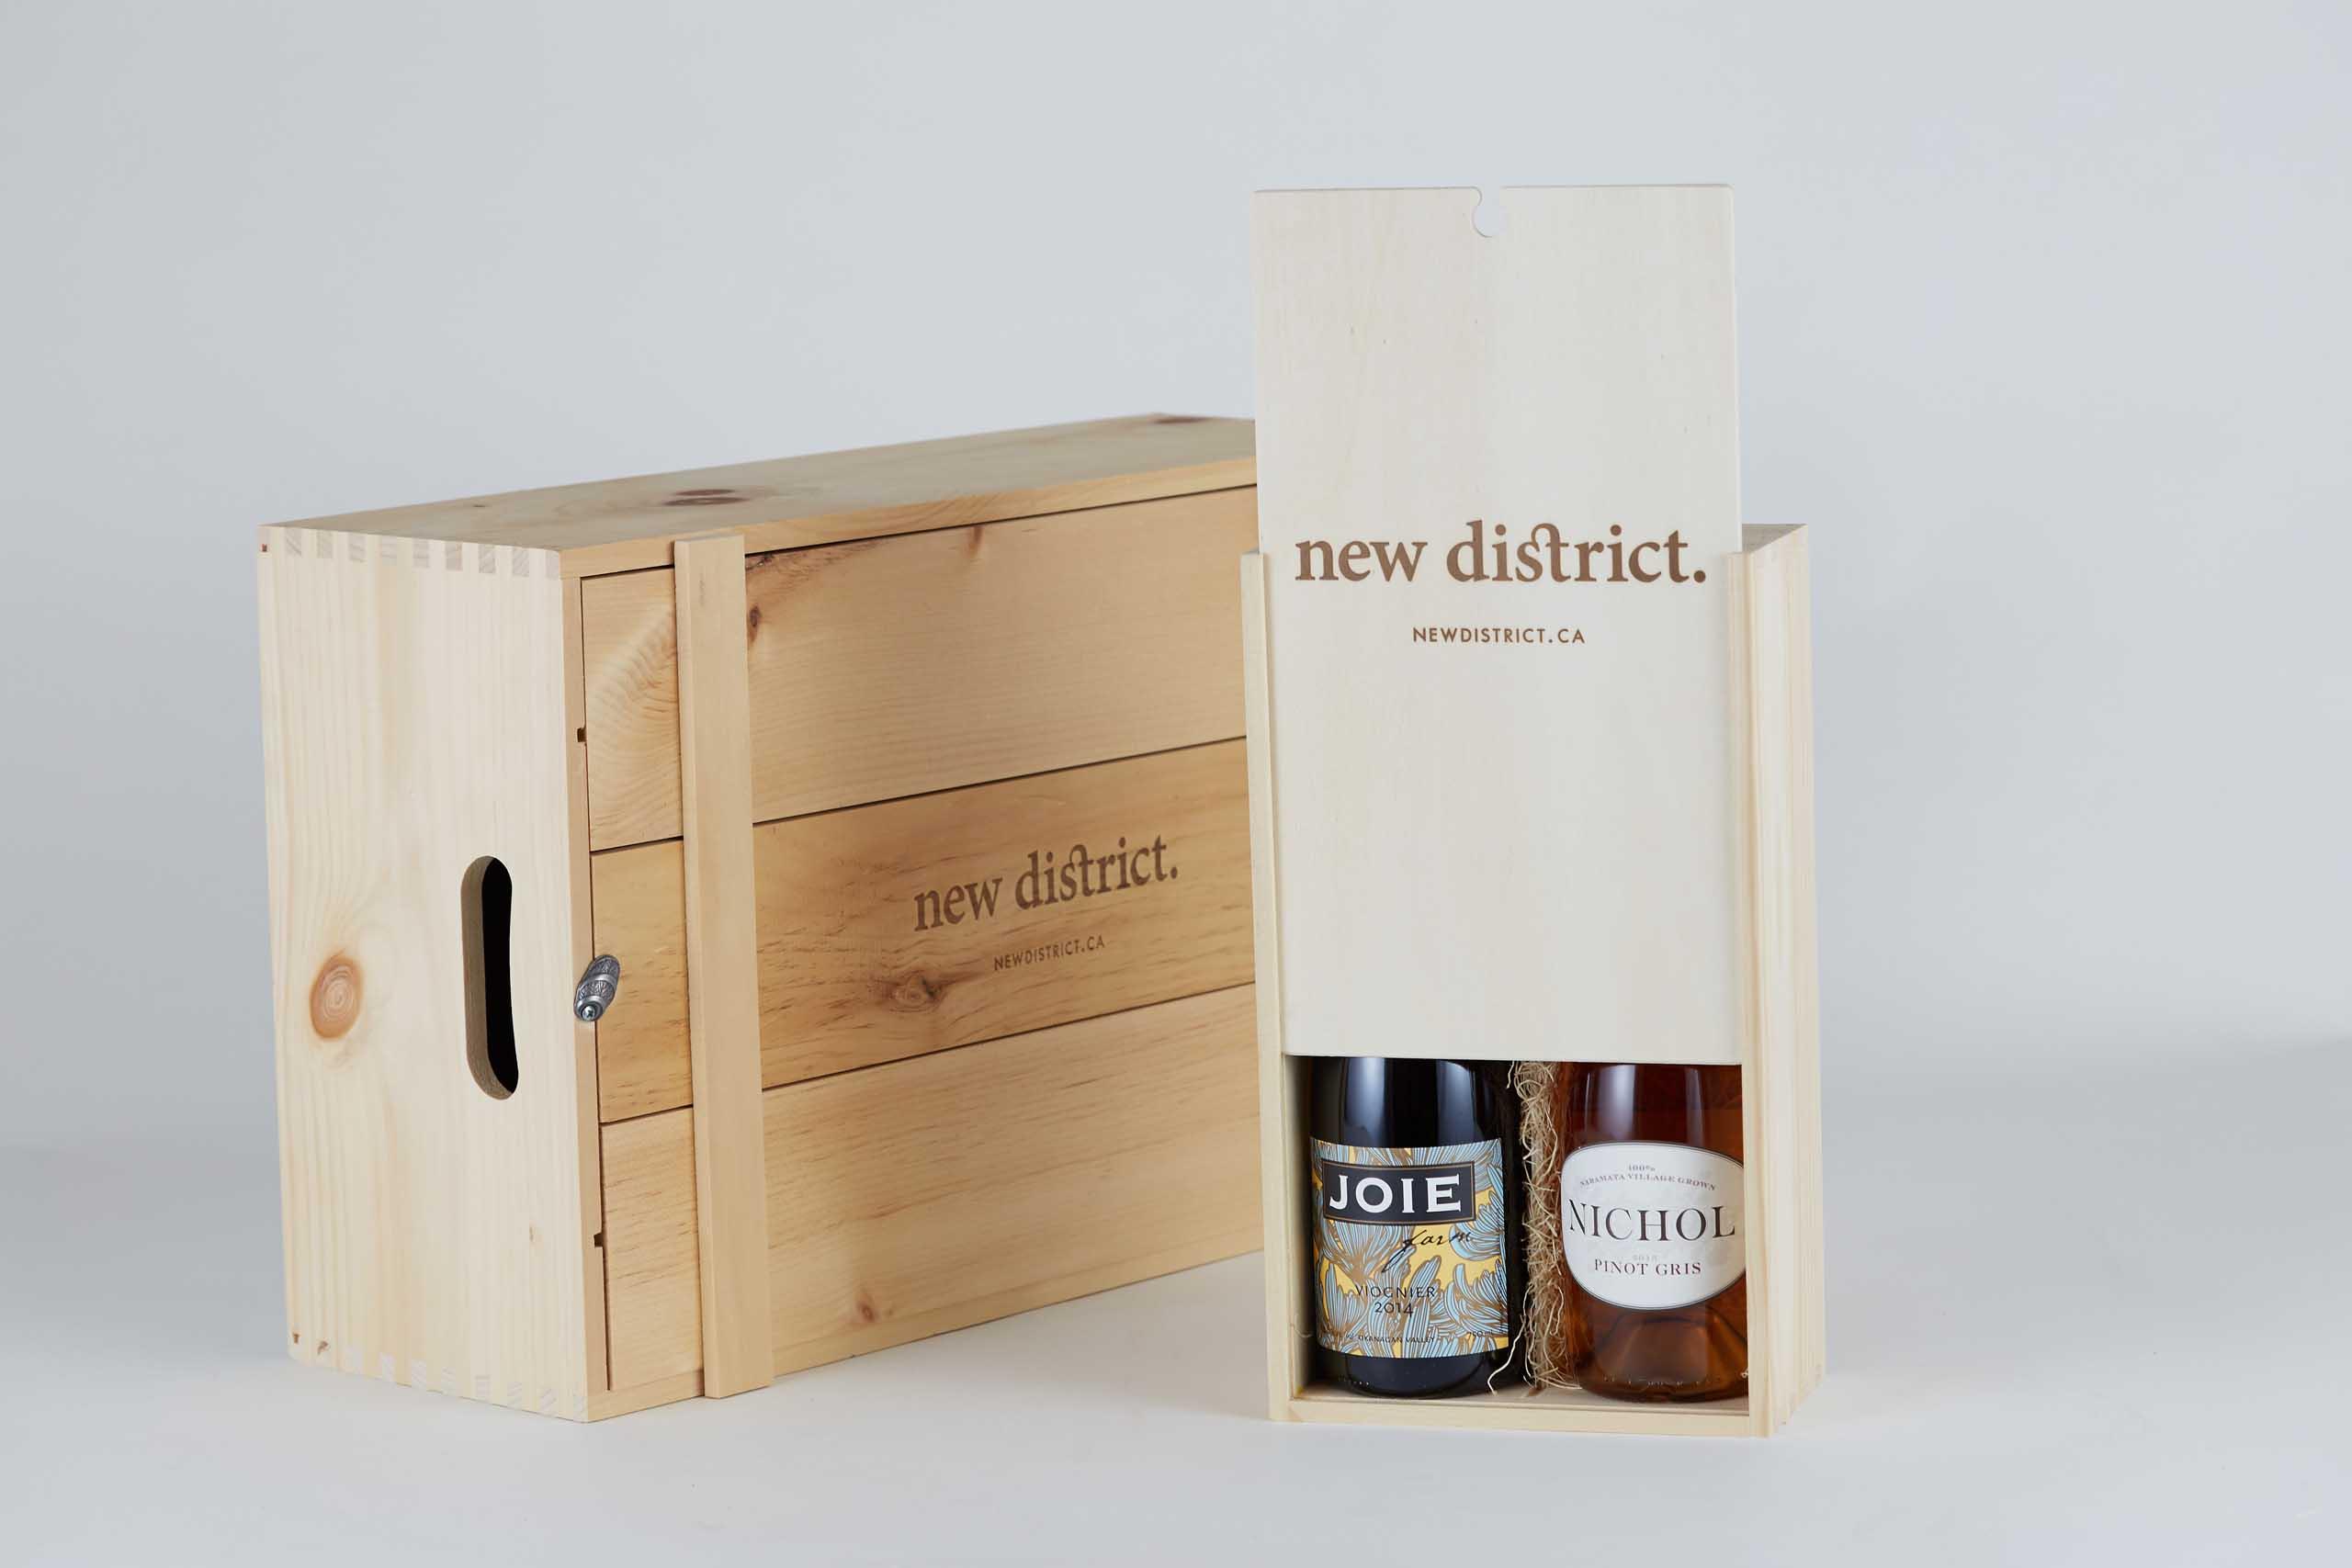 Twelve bottle box and two bottle box together — Yagnyuk.